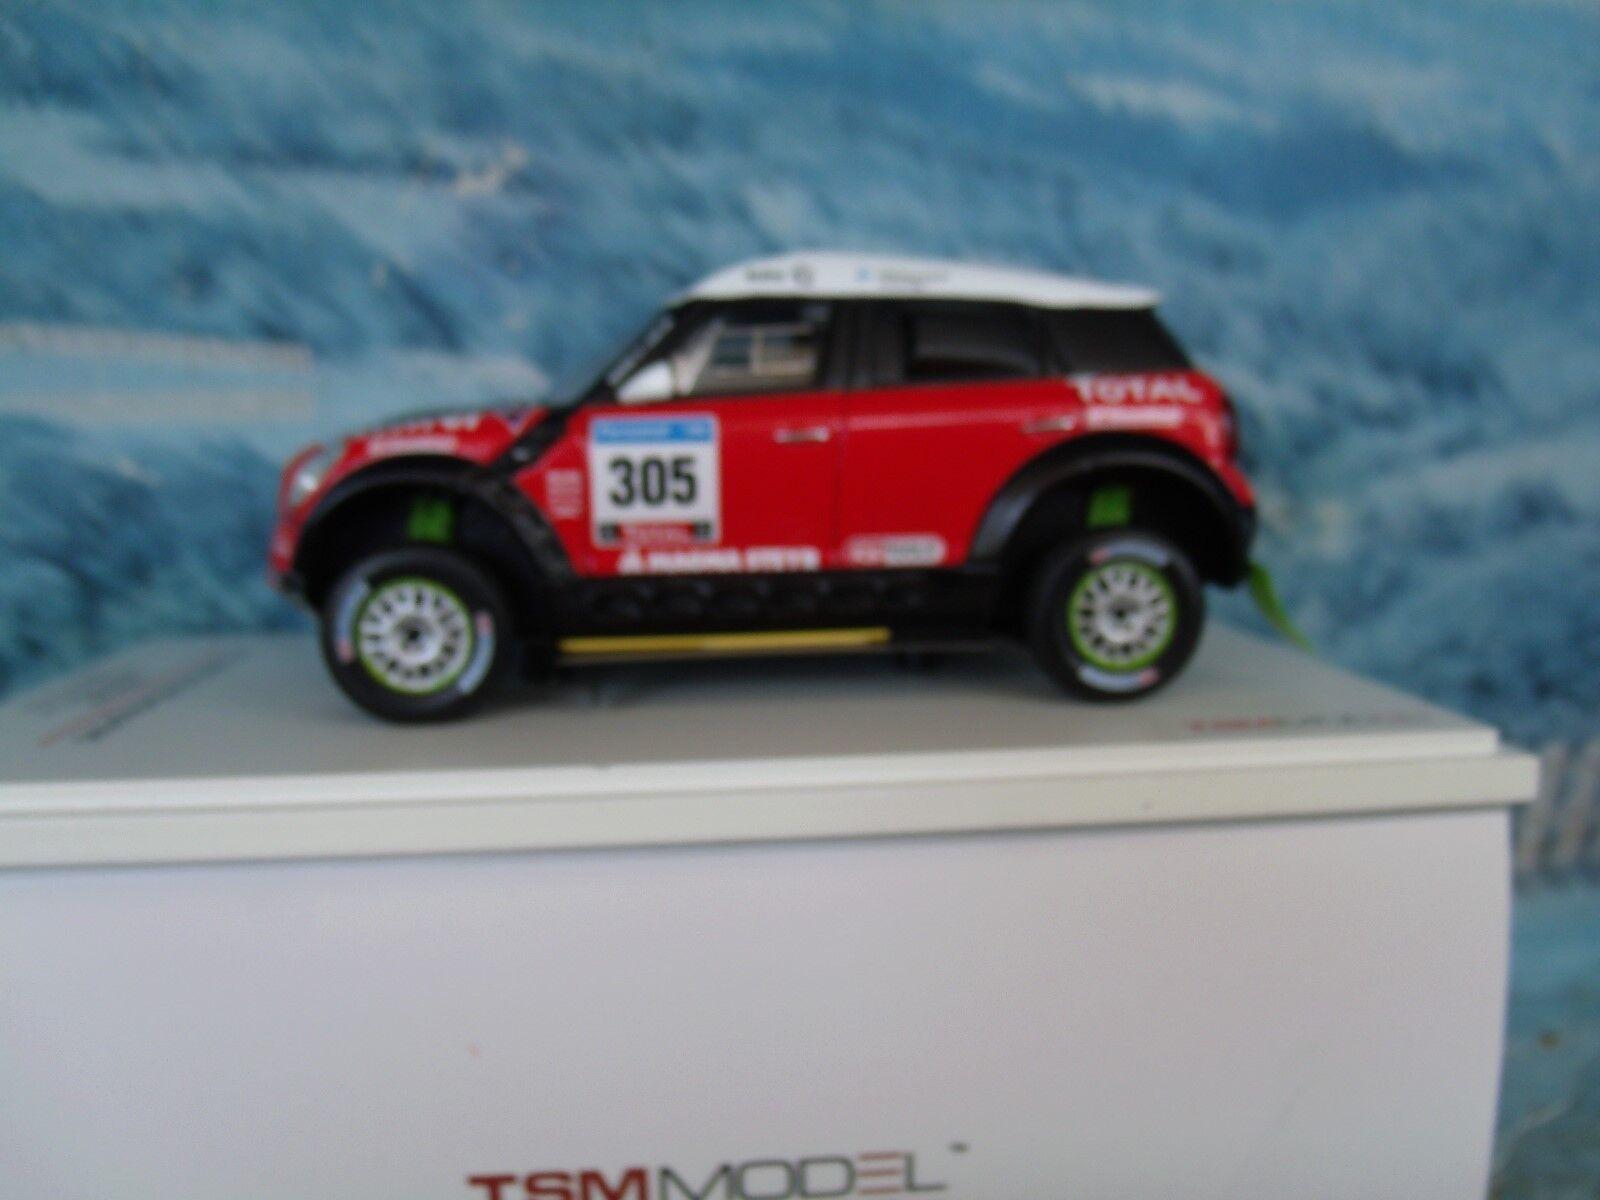 1 43 TrueScale Miniatures (TSM)  Mini ALL4 RACING N.305 DAKAR 2011 TSM114351